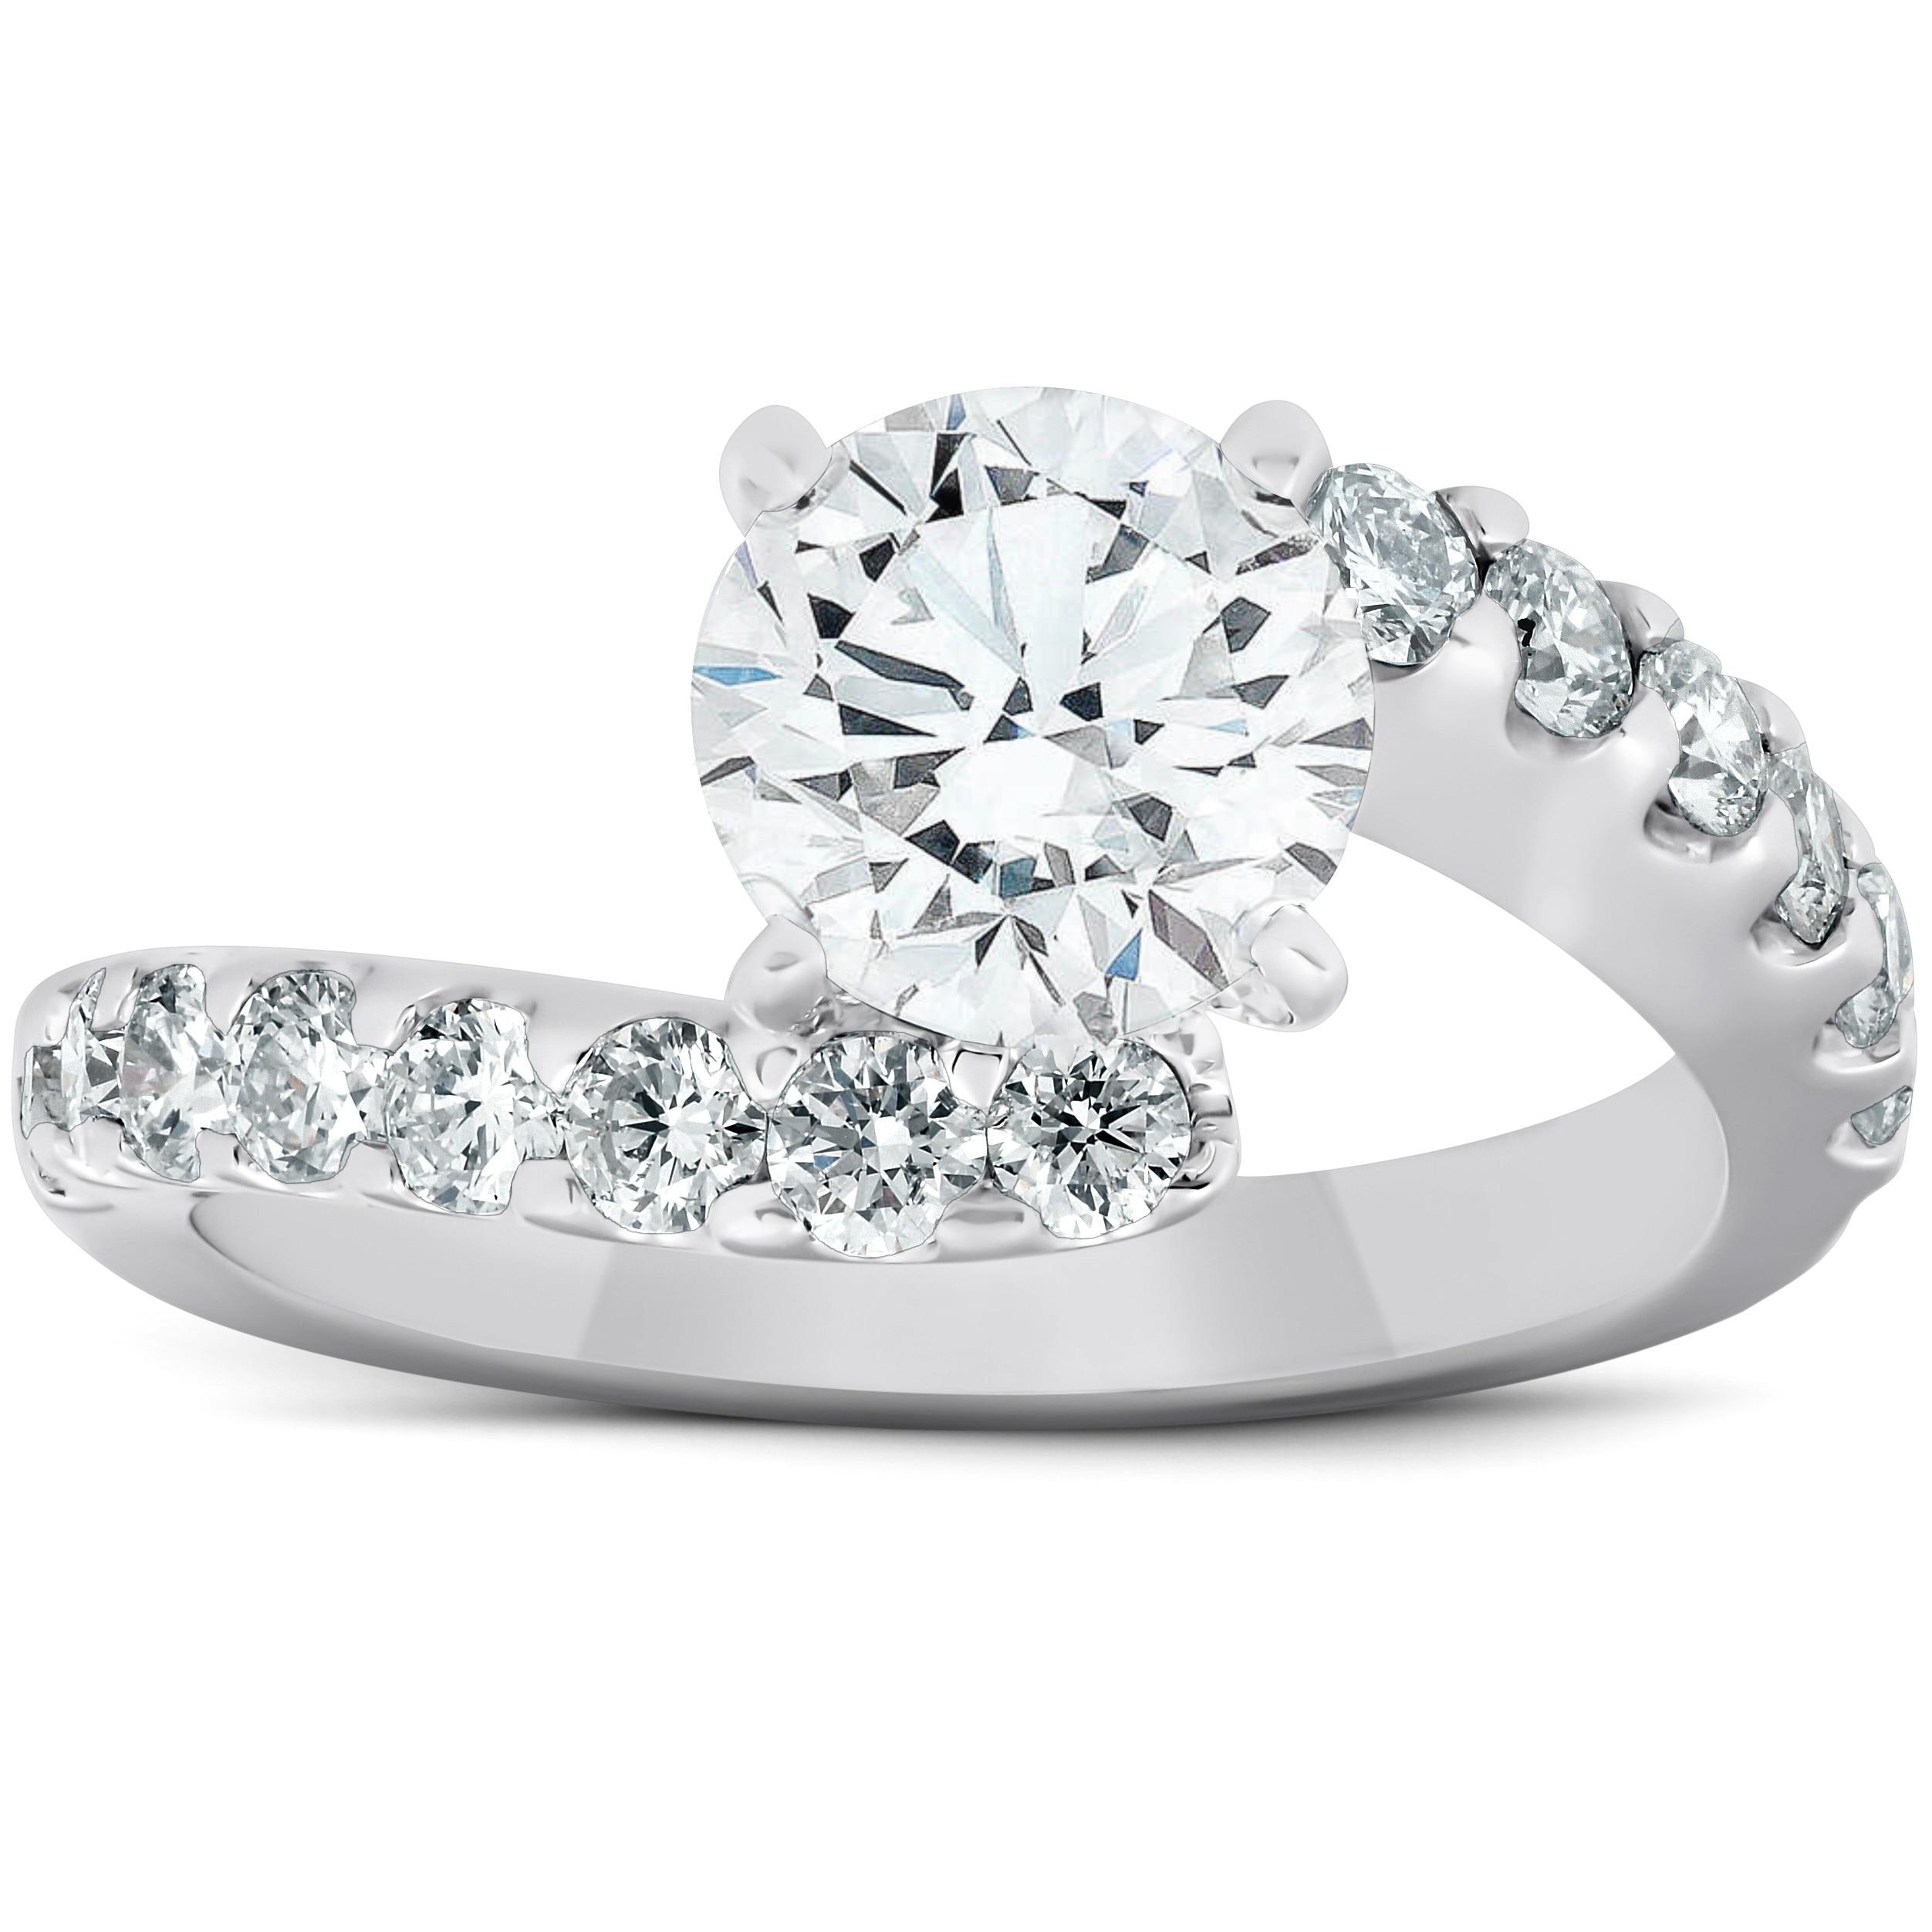 3ct Baguette Halo Diamond Eternity Engagement Band 14k White Gold Over Enhanced